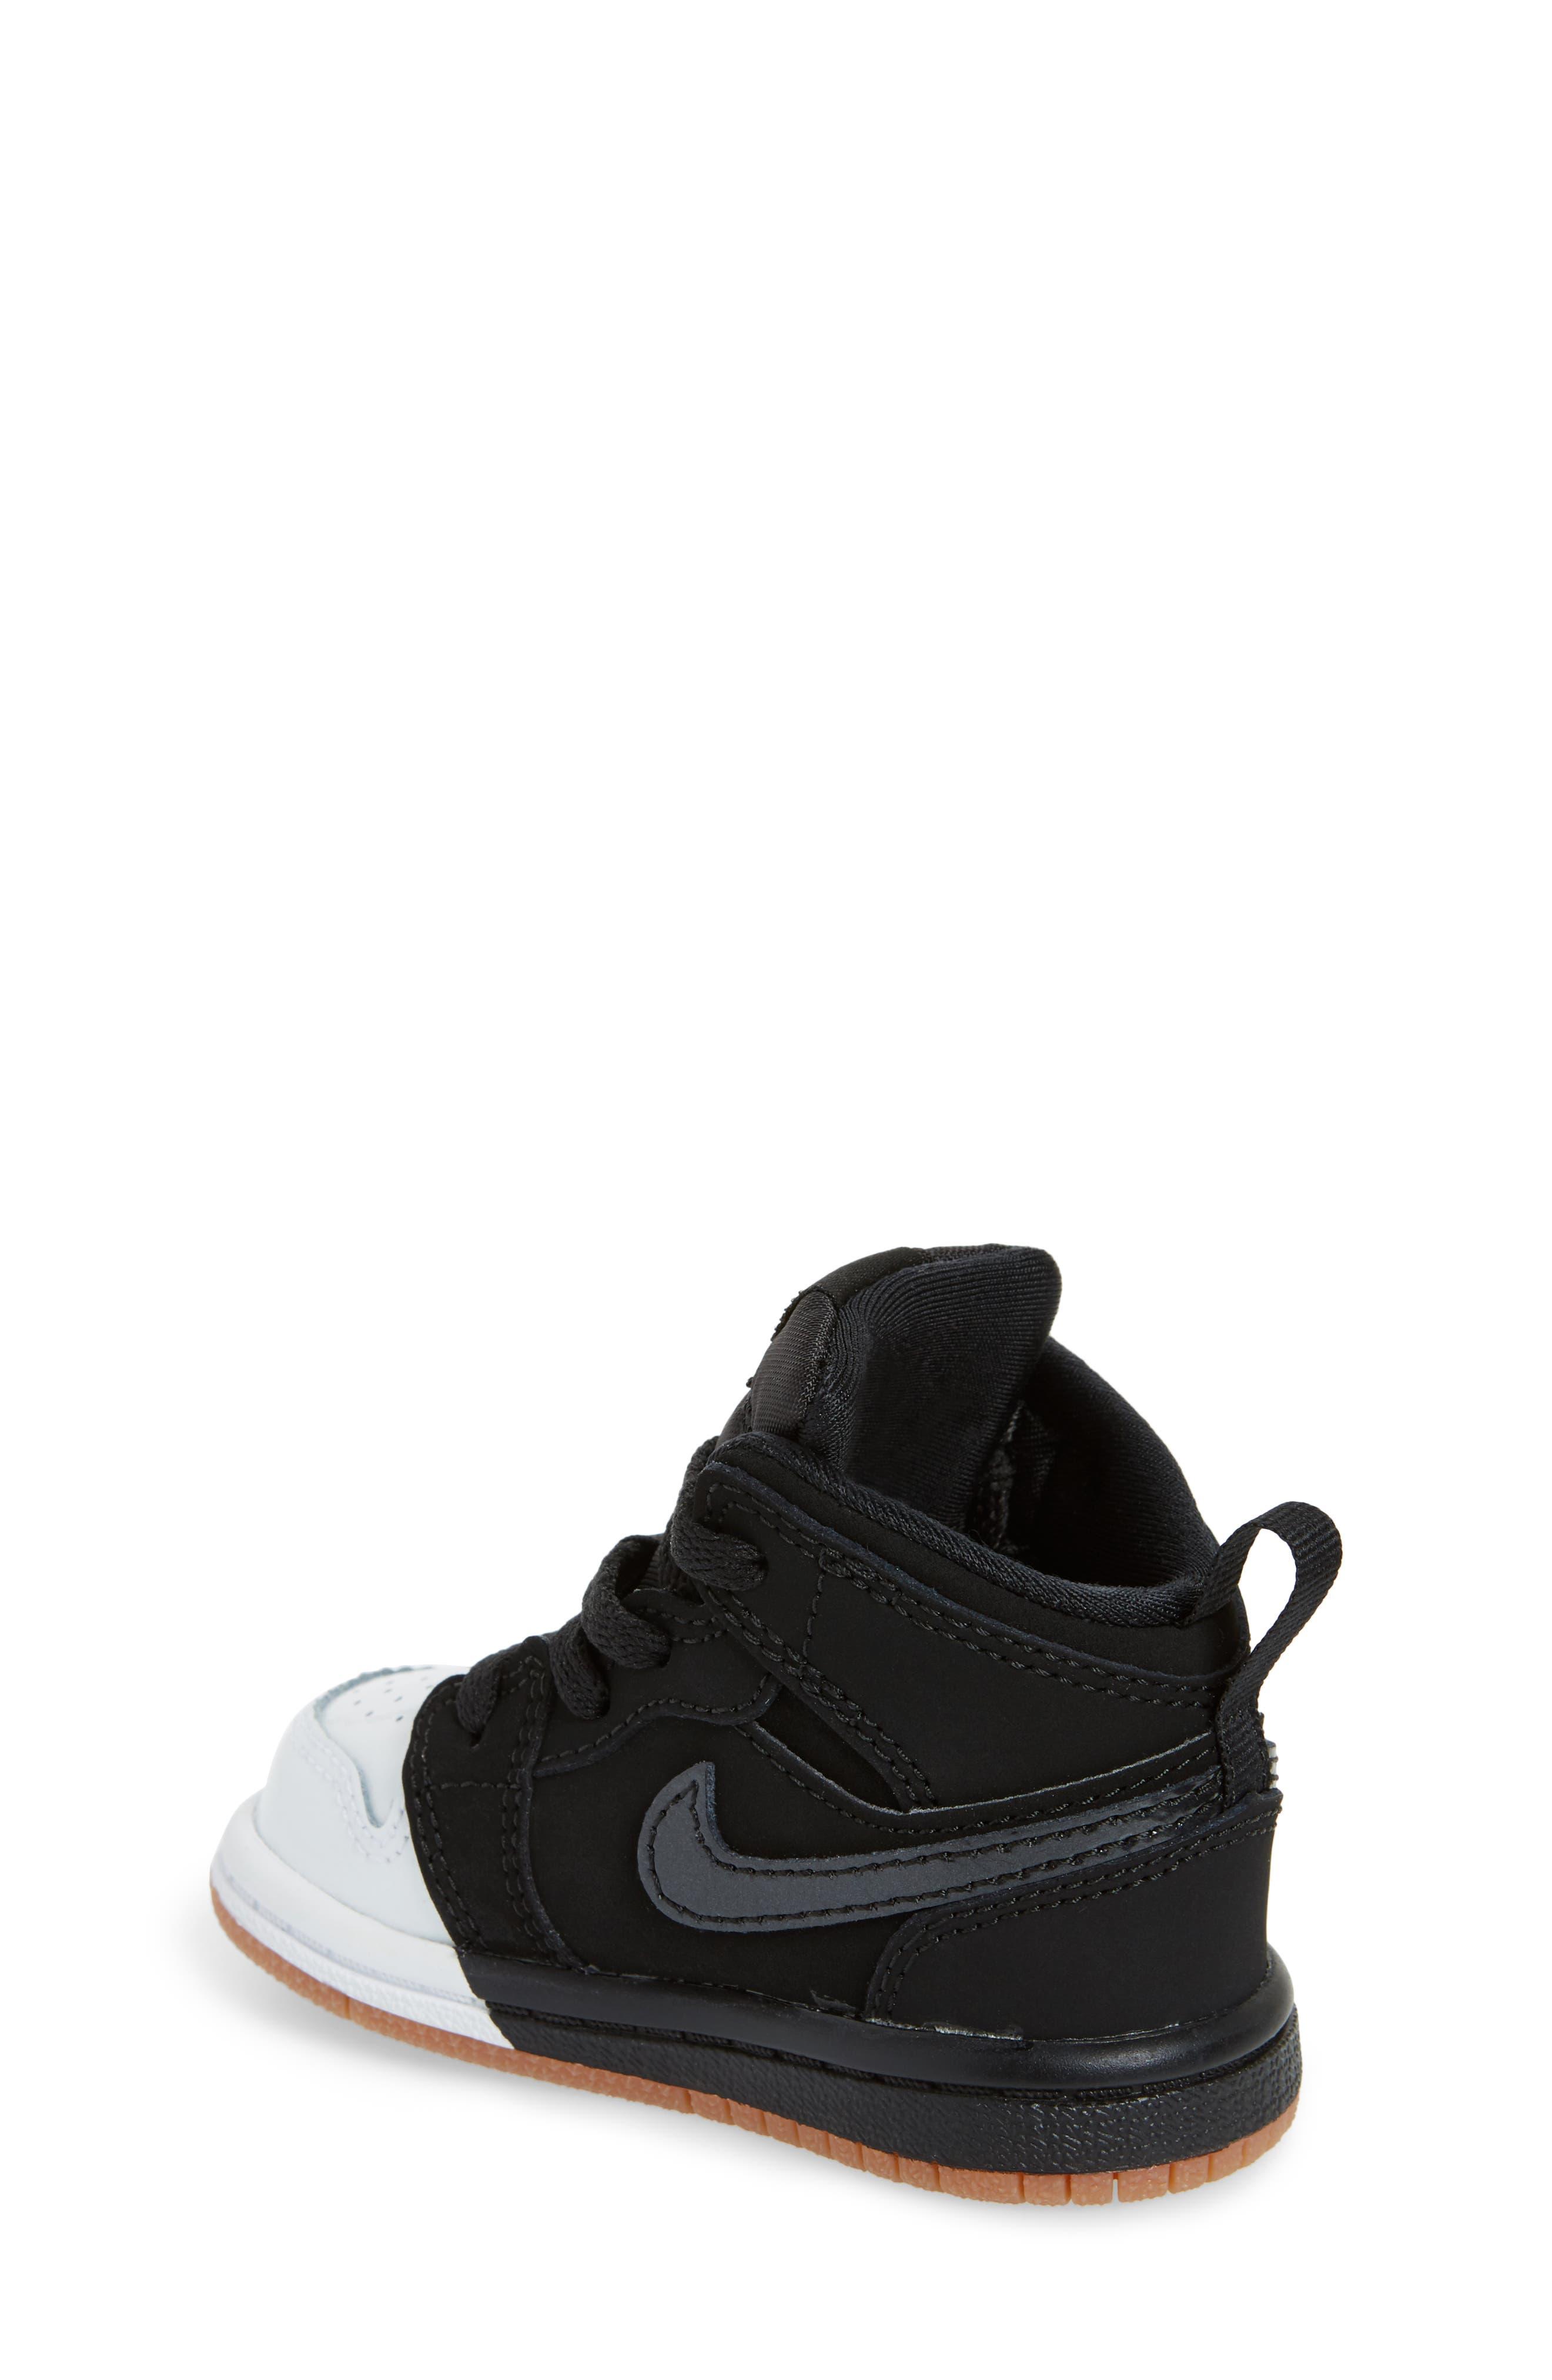 Alternate Image 2  - Nike 'Jordan 1 Mid' Basketball Shoe (Walker)